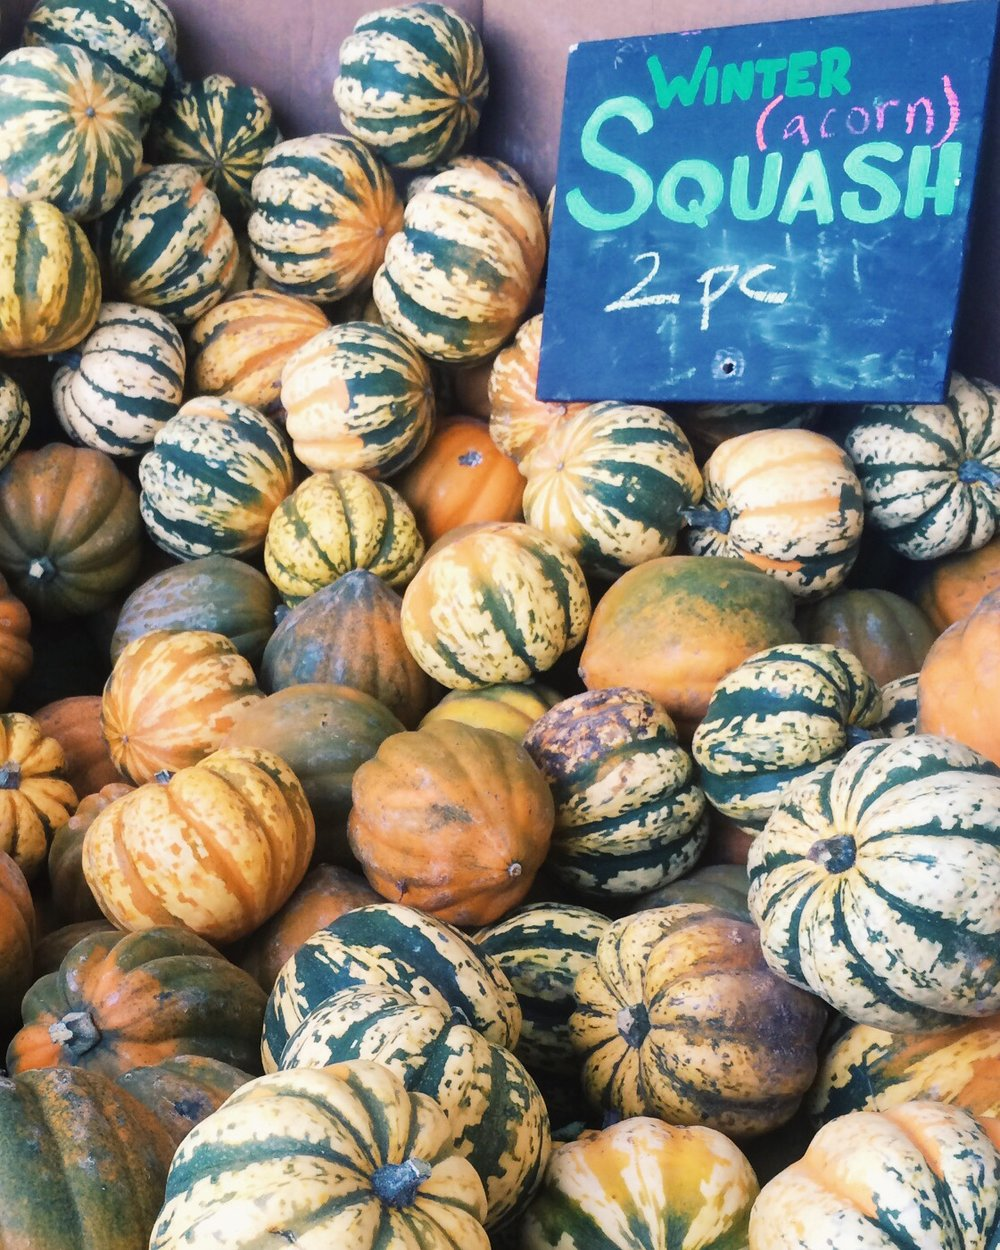 Harvest Winter Squash.JPG